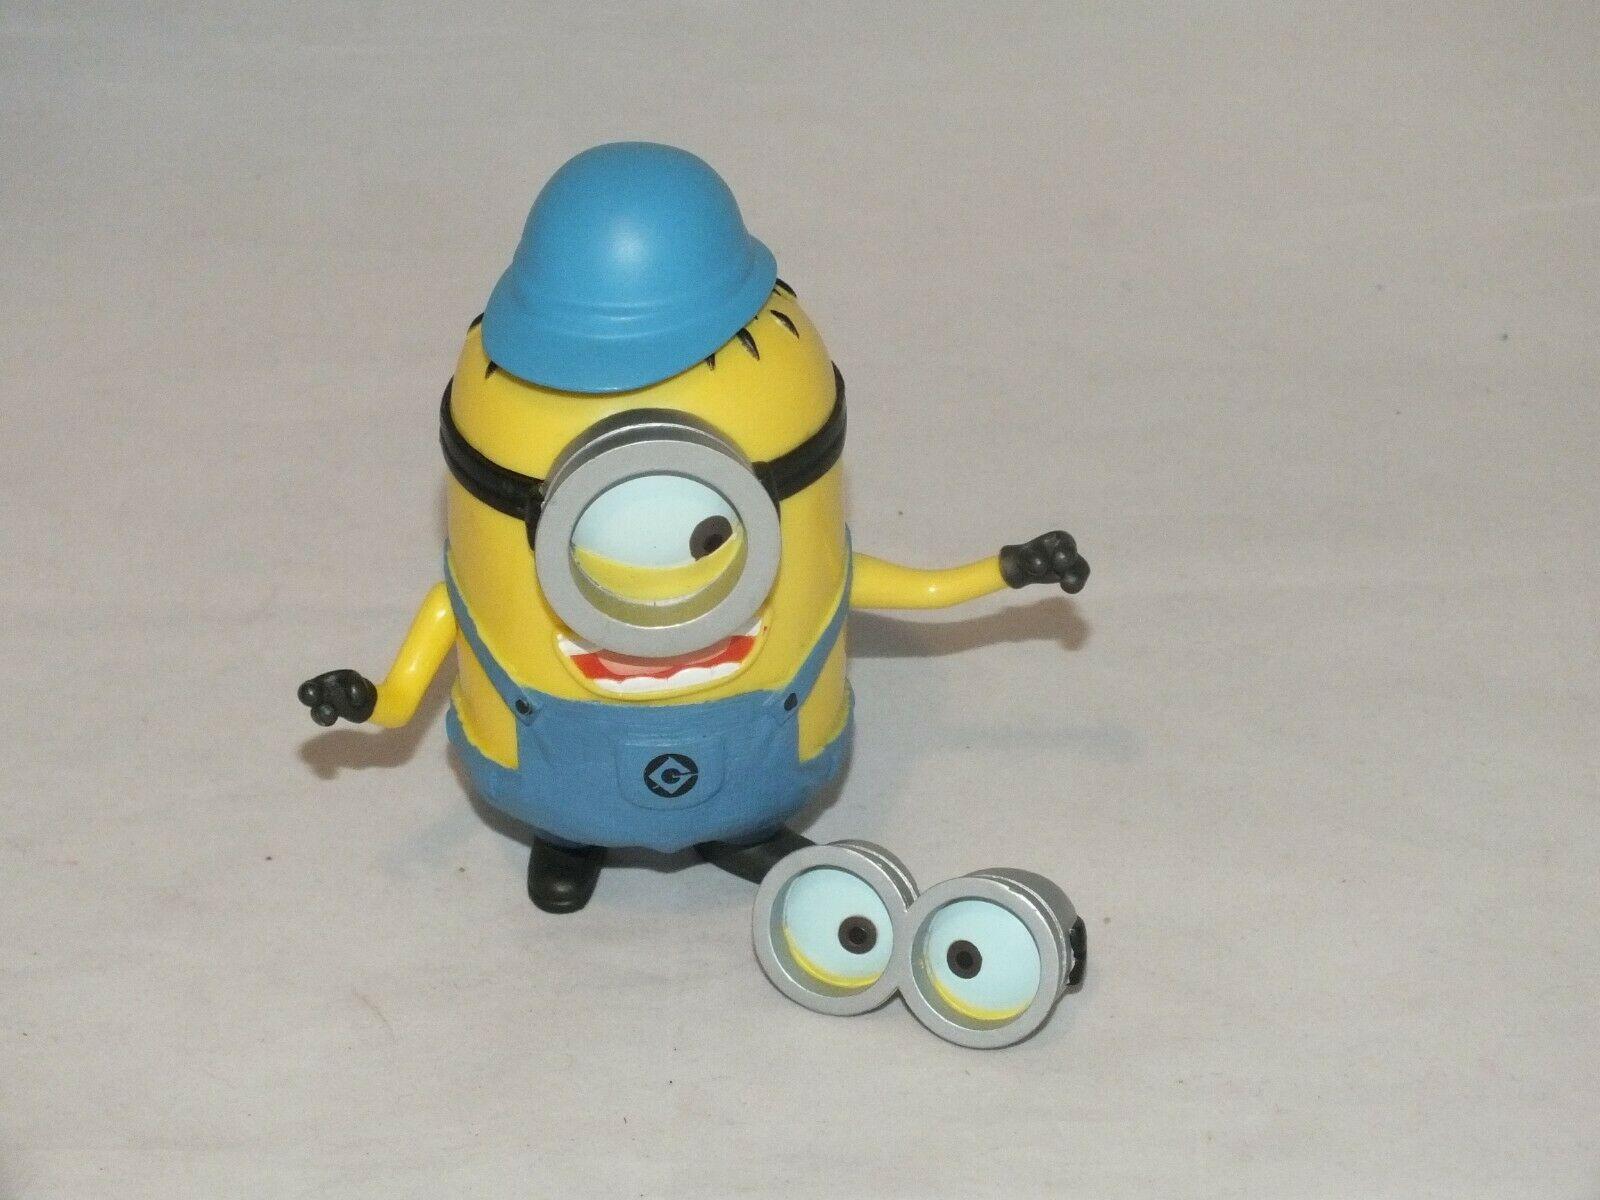 Build A Minion Despicable Me Minion Mayhem Figure Universal Studios - $13.65